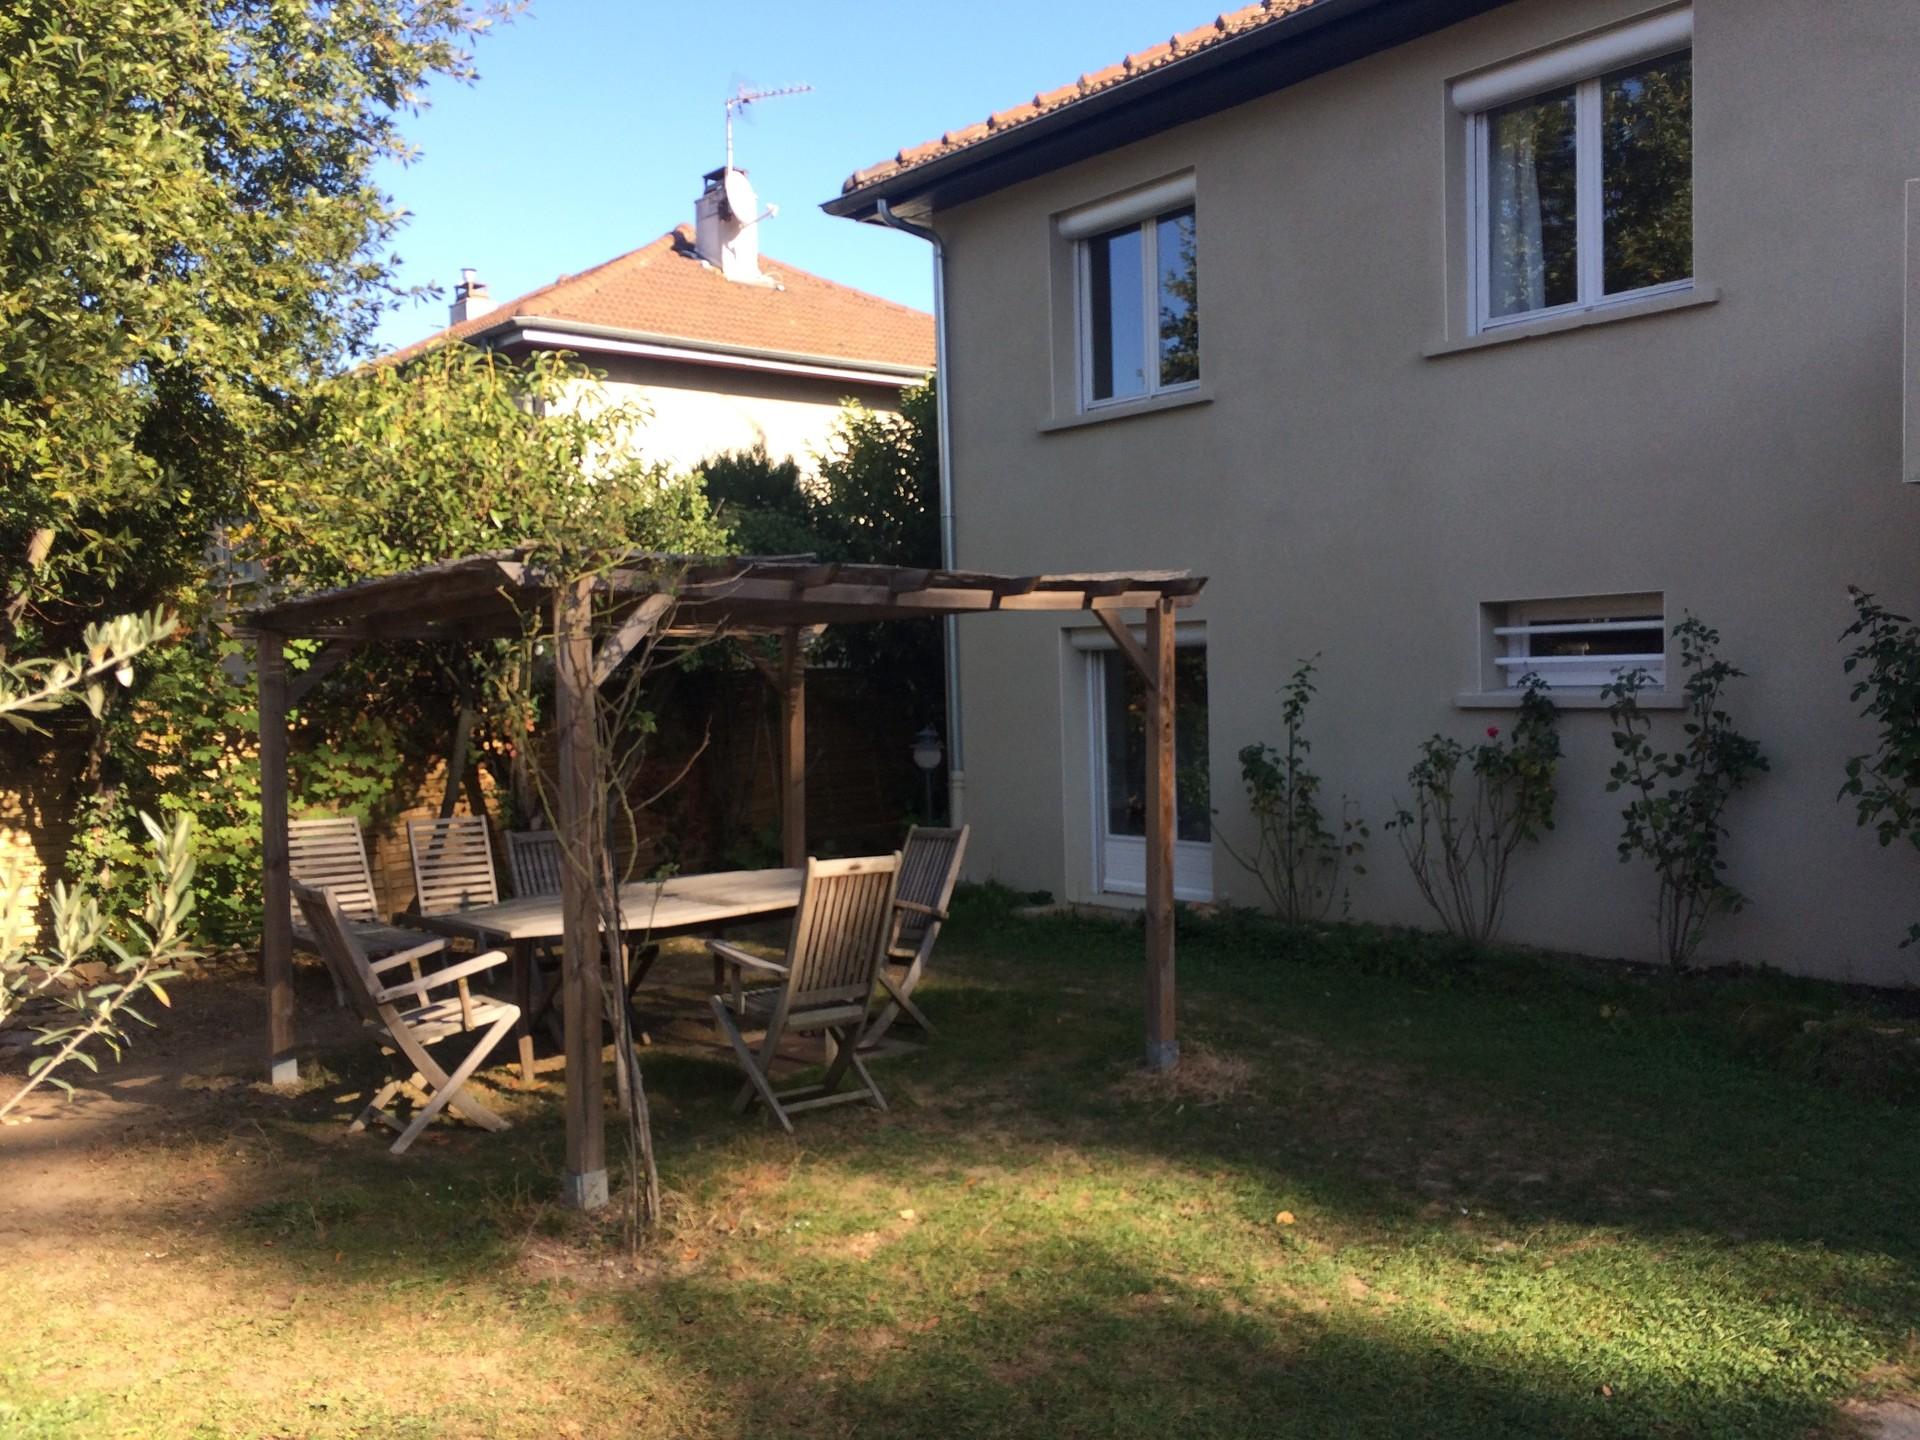 one-room-apartment-quiet-house-german-native-speaker-68b38035bcbb3063e7059d98bd763b61